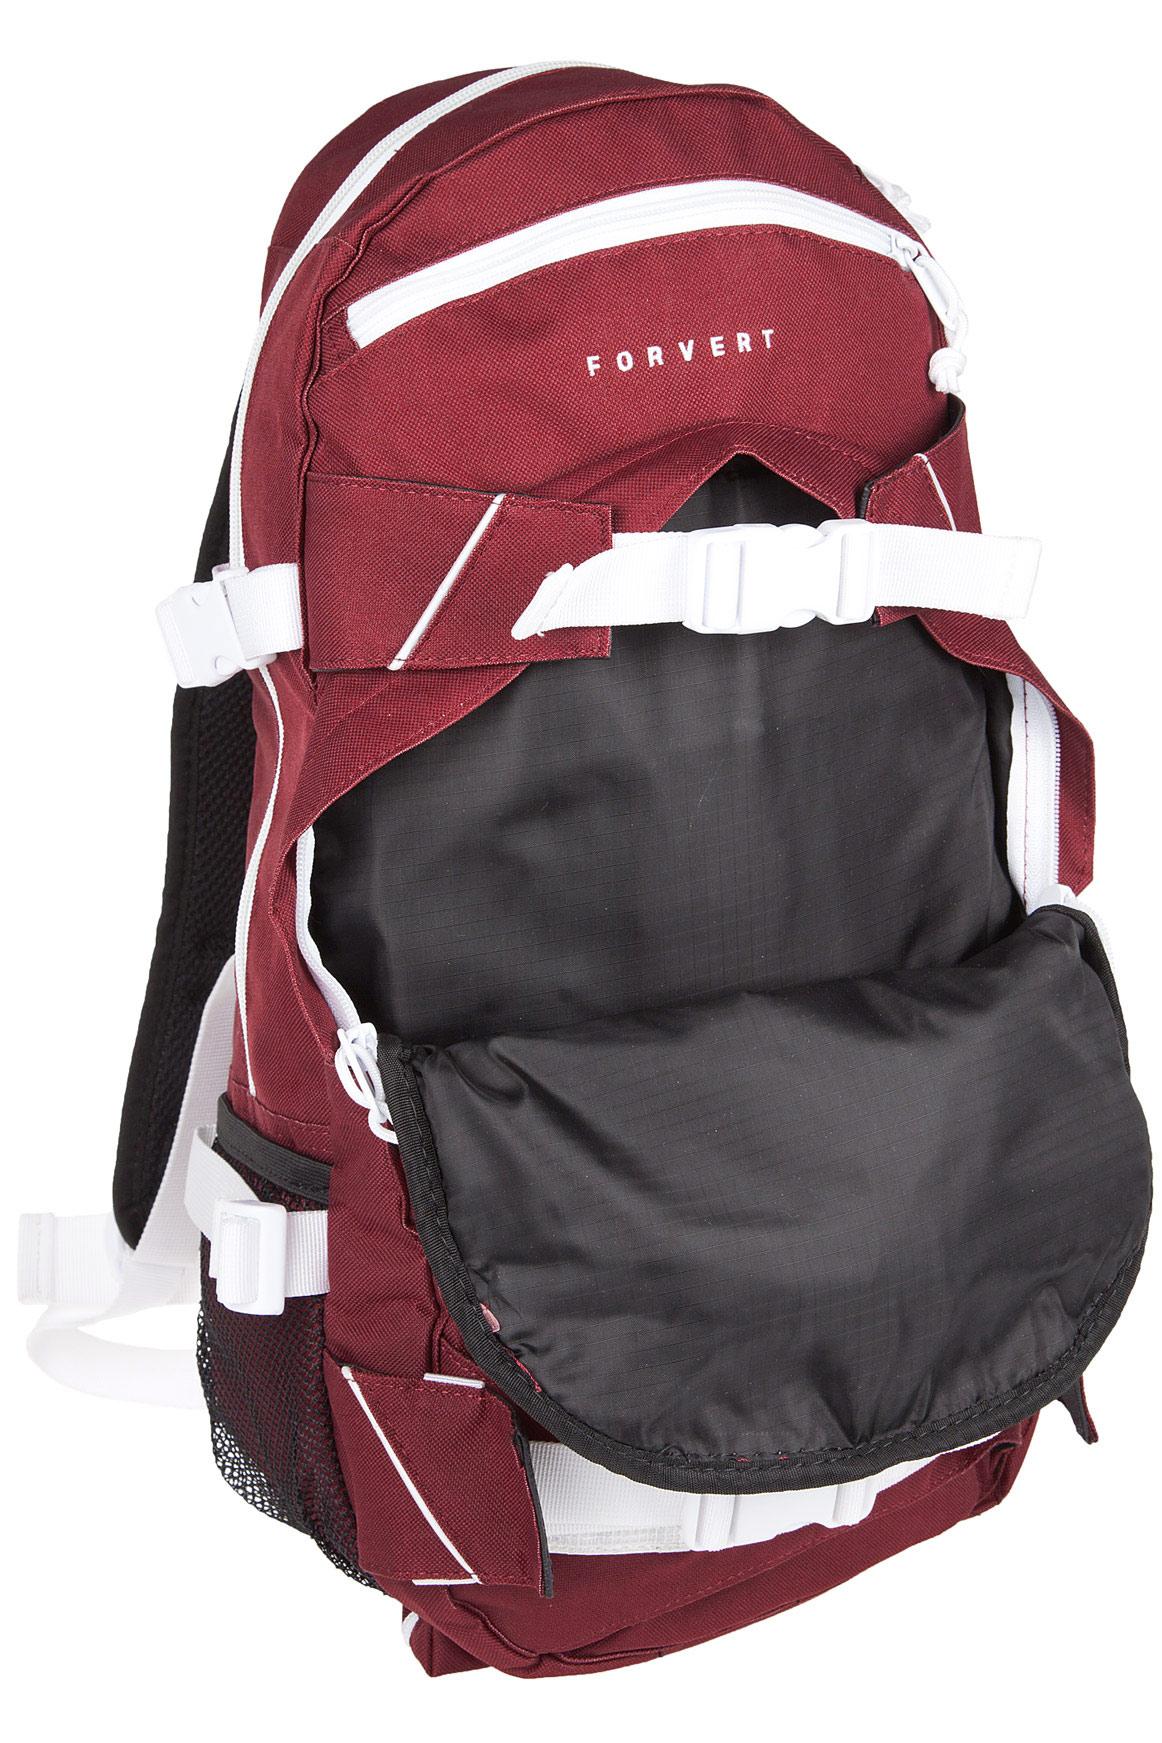 forvert ice louis backpack 20l burgundy achetez sur. Black Bedroom Furniture Sets. Home Design Ideas